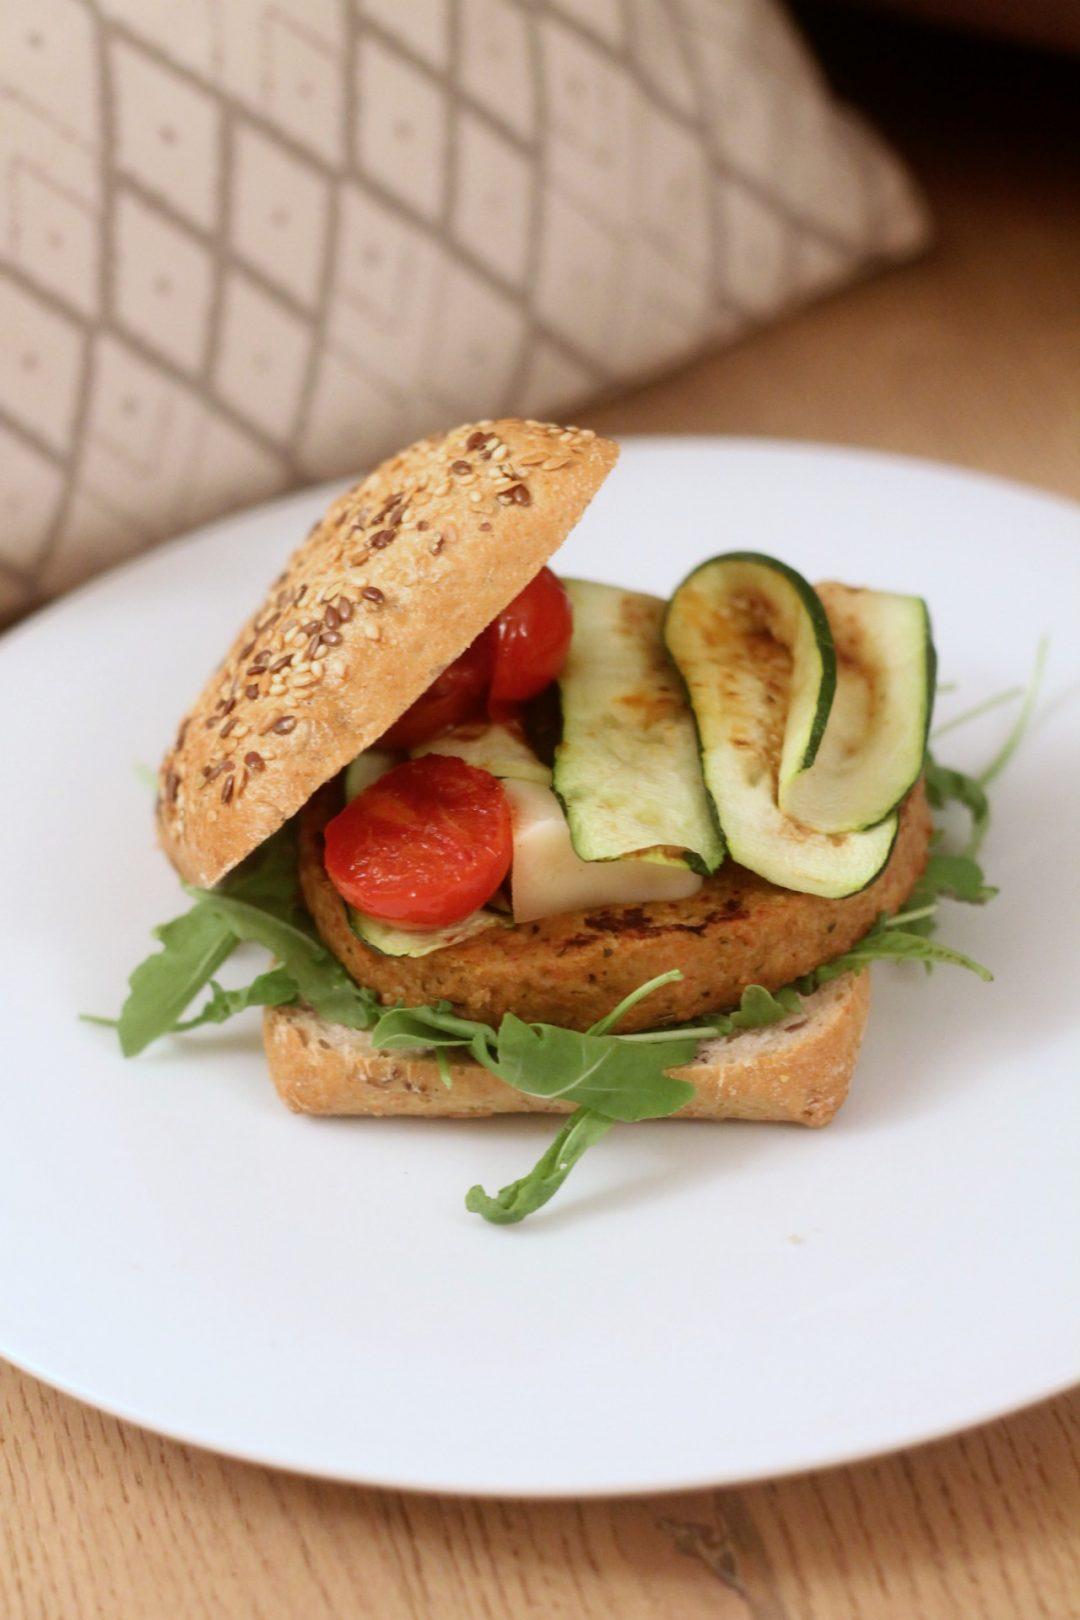 veggy-burger-gorgonzola-zucchine-grigliate-e-pomodorini-confit